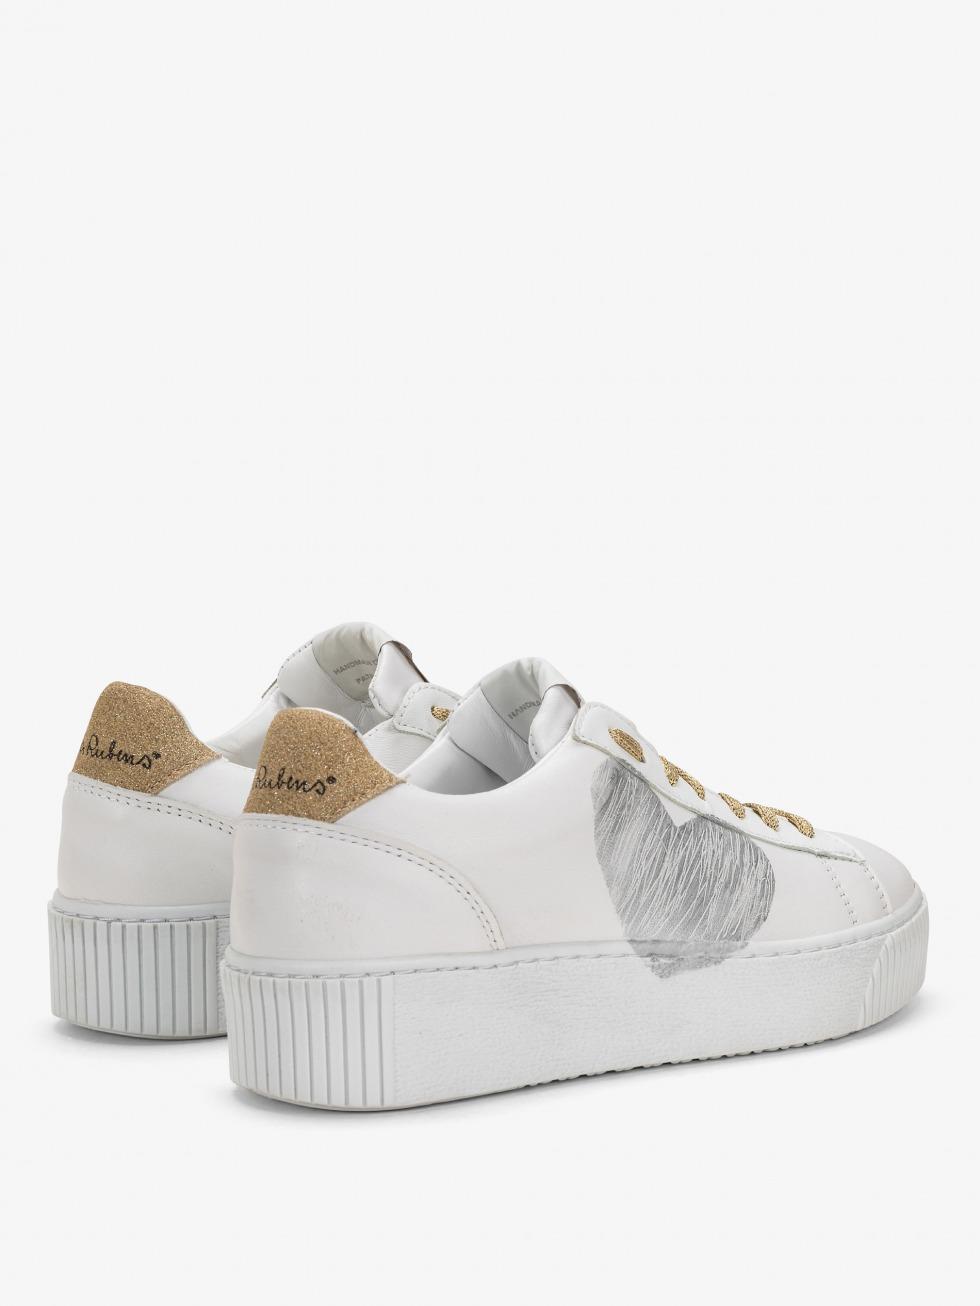 Cosmopolitan Sneakers - Luxury Gold Heart